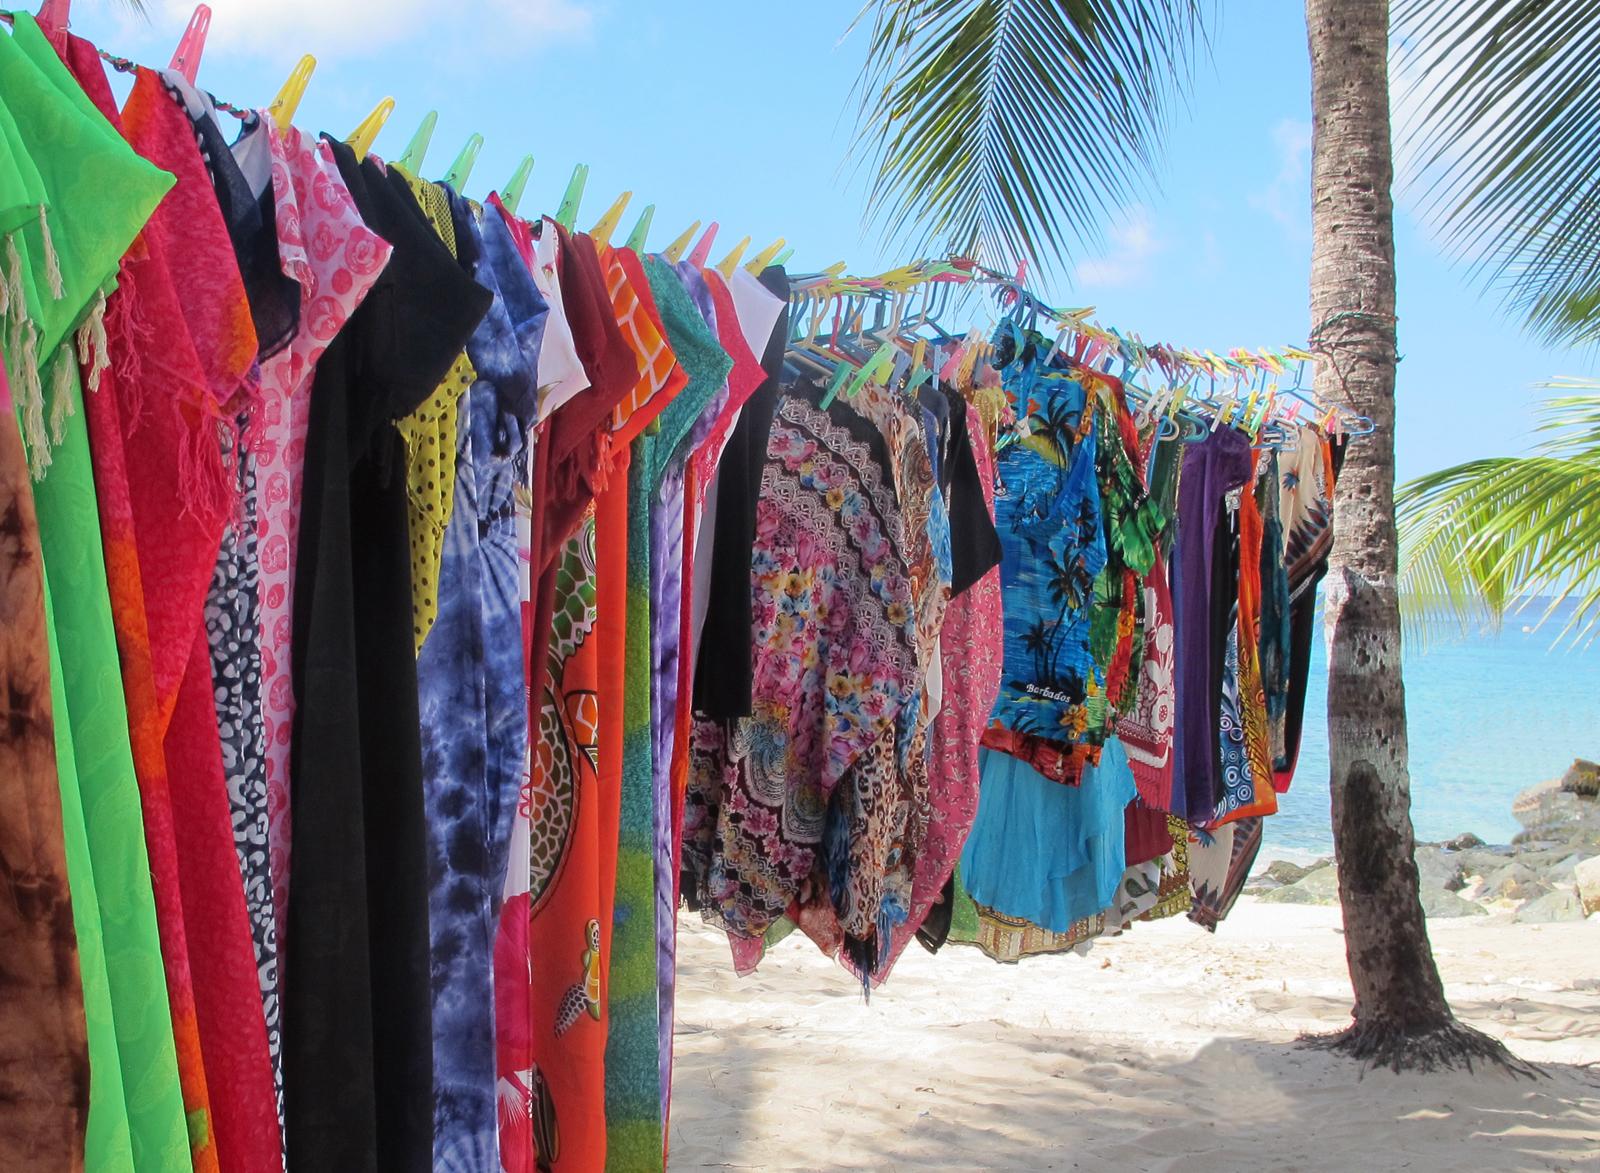 Doreen McLean_Shopping on the beach_None